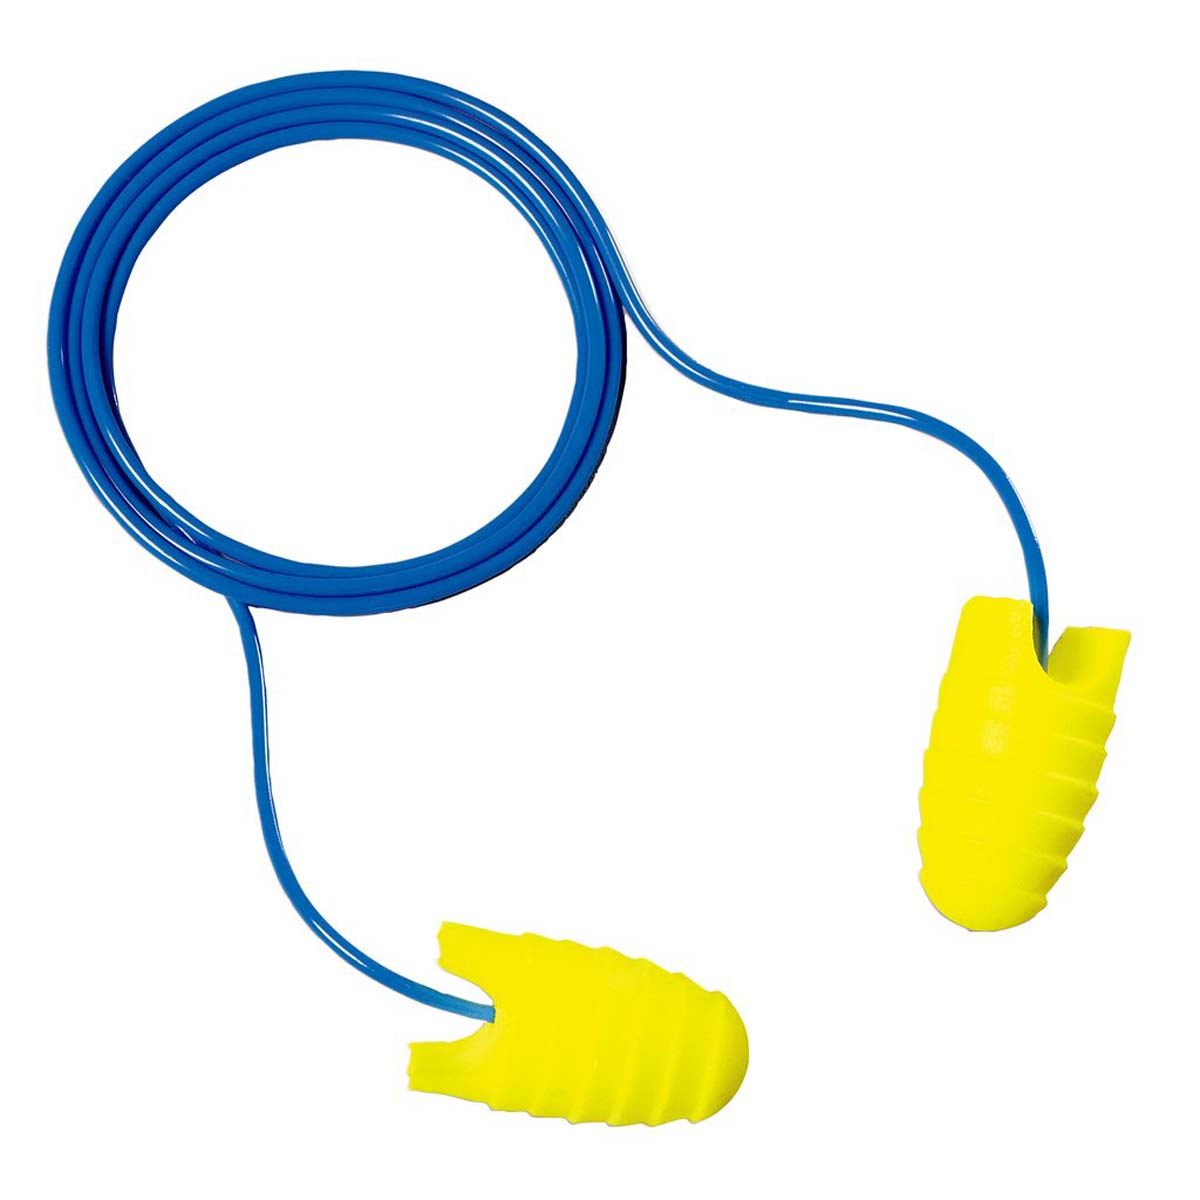 "3Mâ""¢ E-A-Rsoftâ""¢ Grippersâ""¢ Corded Earplugs 312-6001 20"